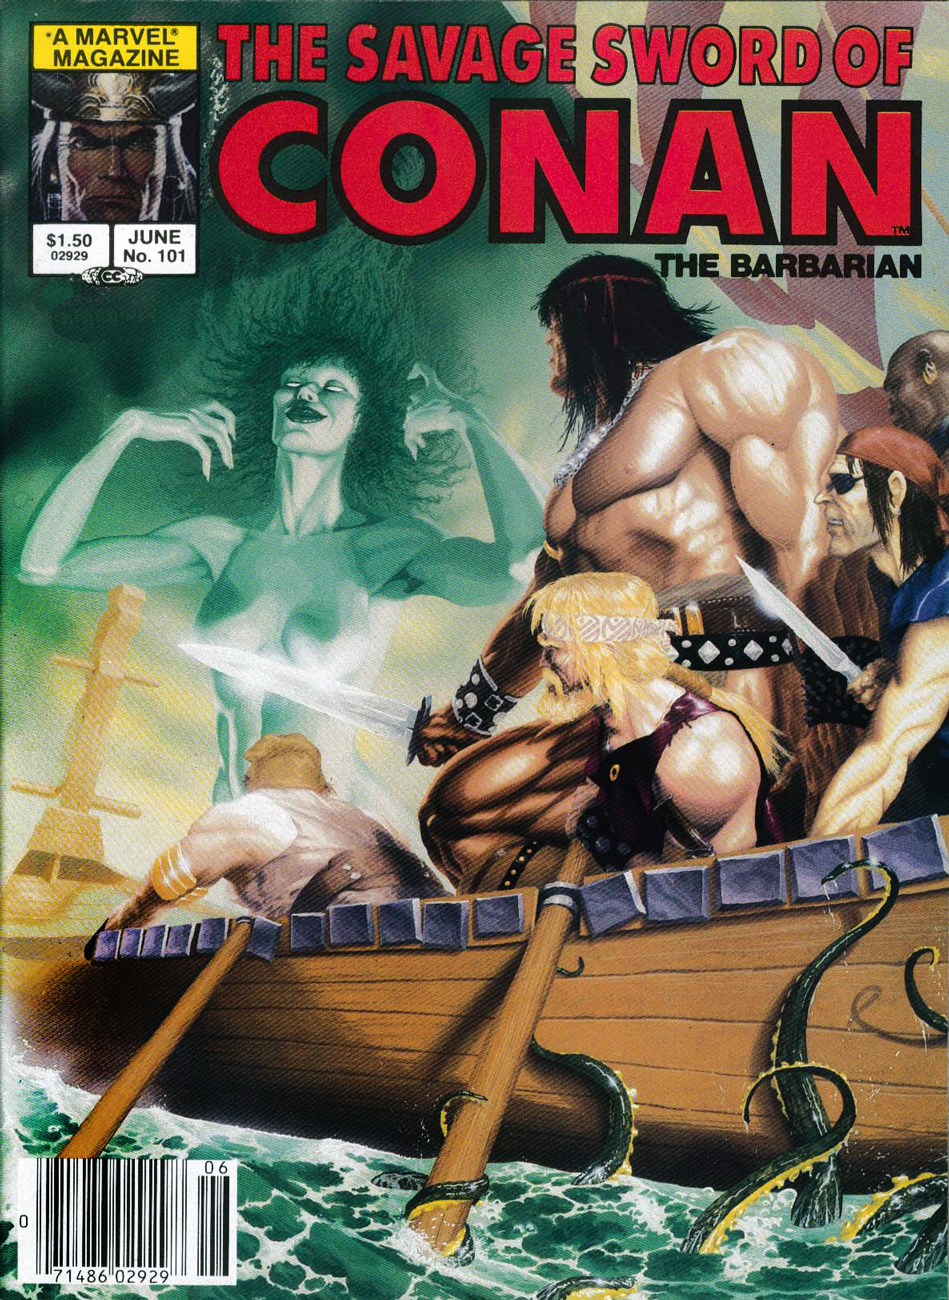 The-Savage-Sword-of-Conan-#101